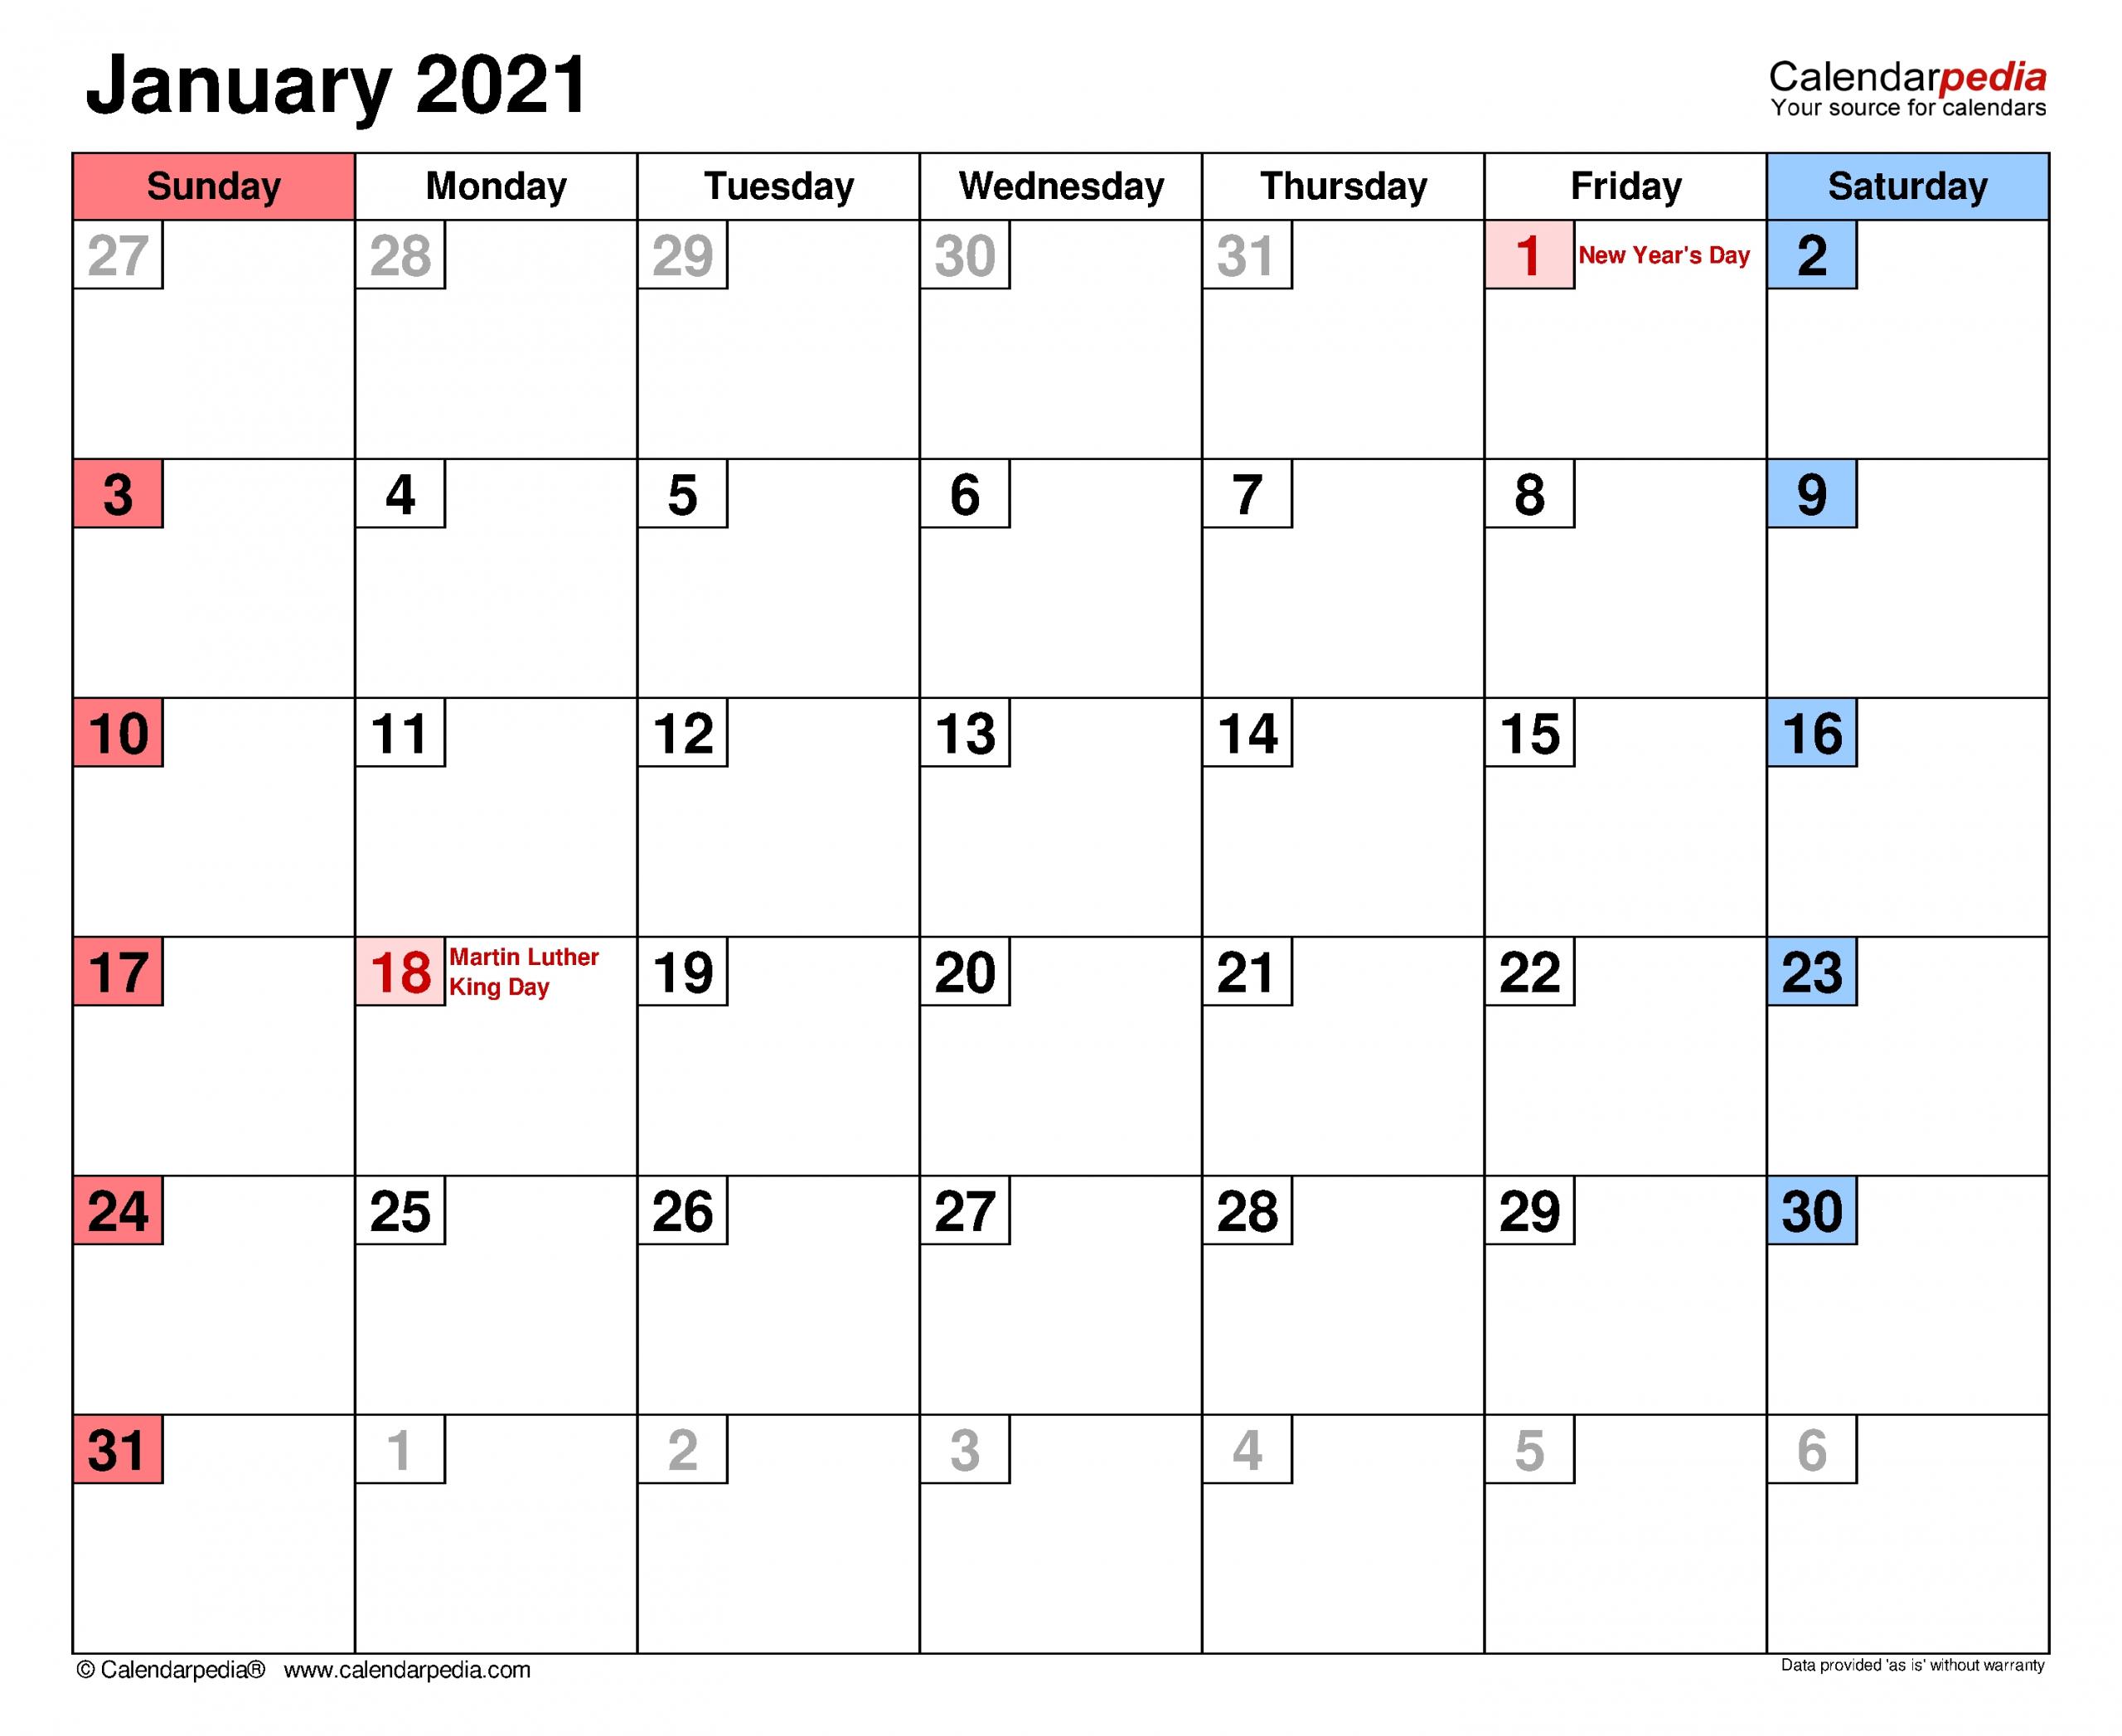 Monthly Calendar With Writing Space Printable 2021 - Calendar Inspiration Design